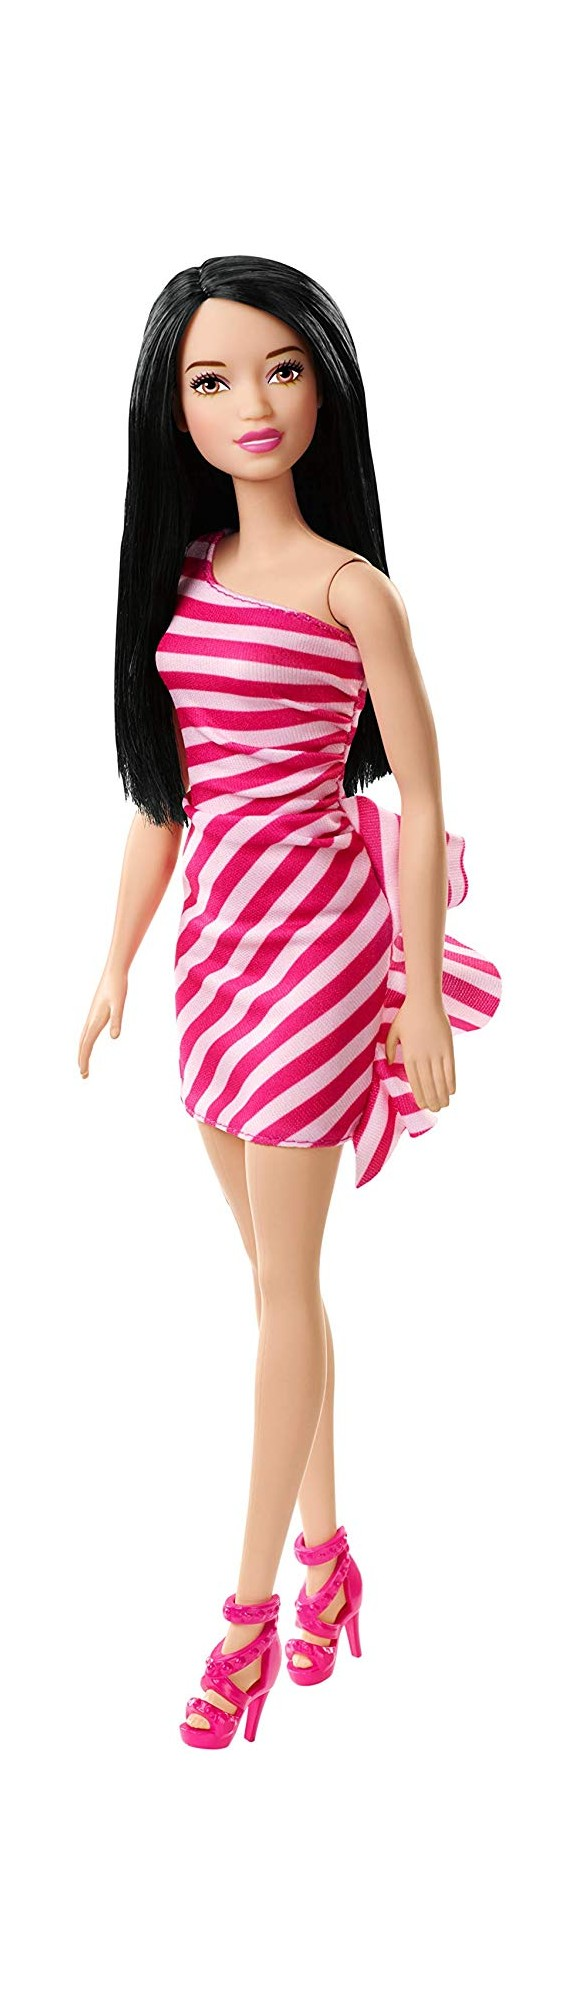 Barbie - Wearing Stripes - Pink (FXL70)